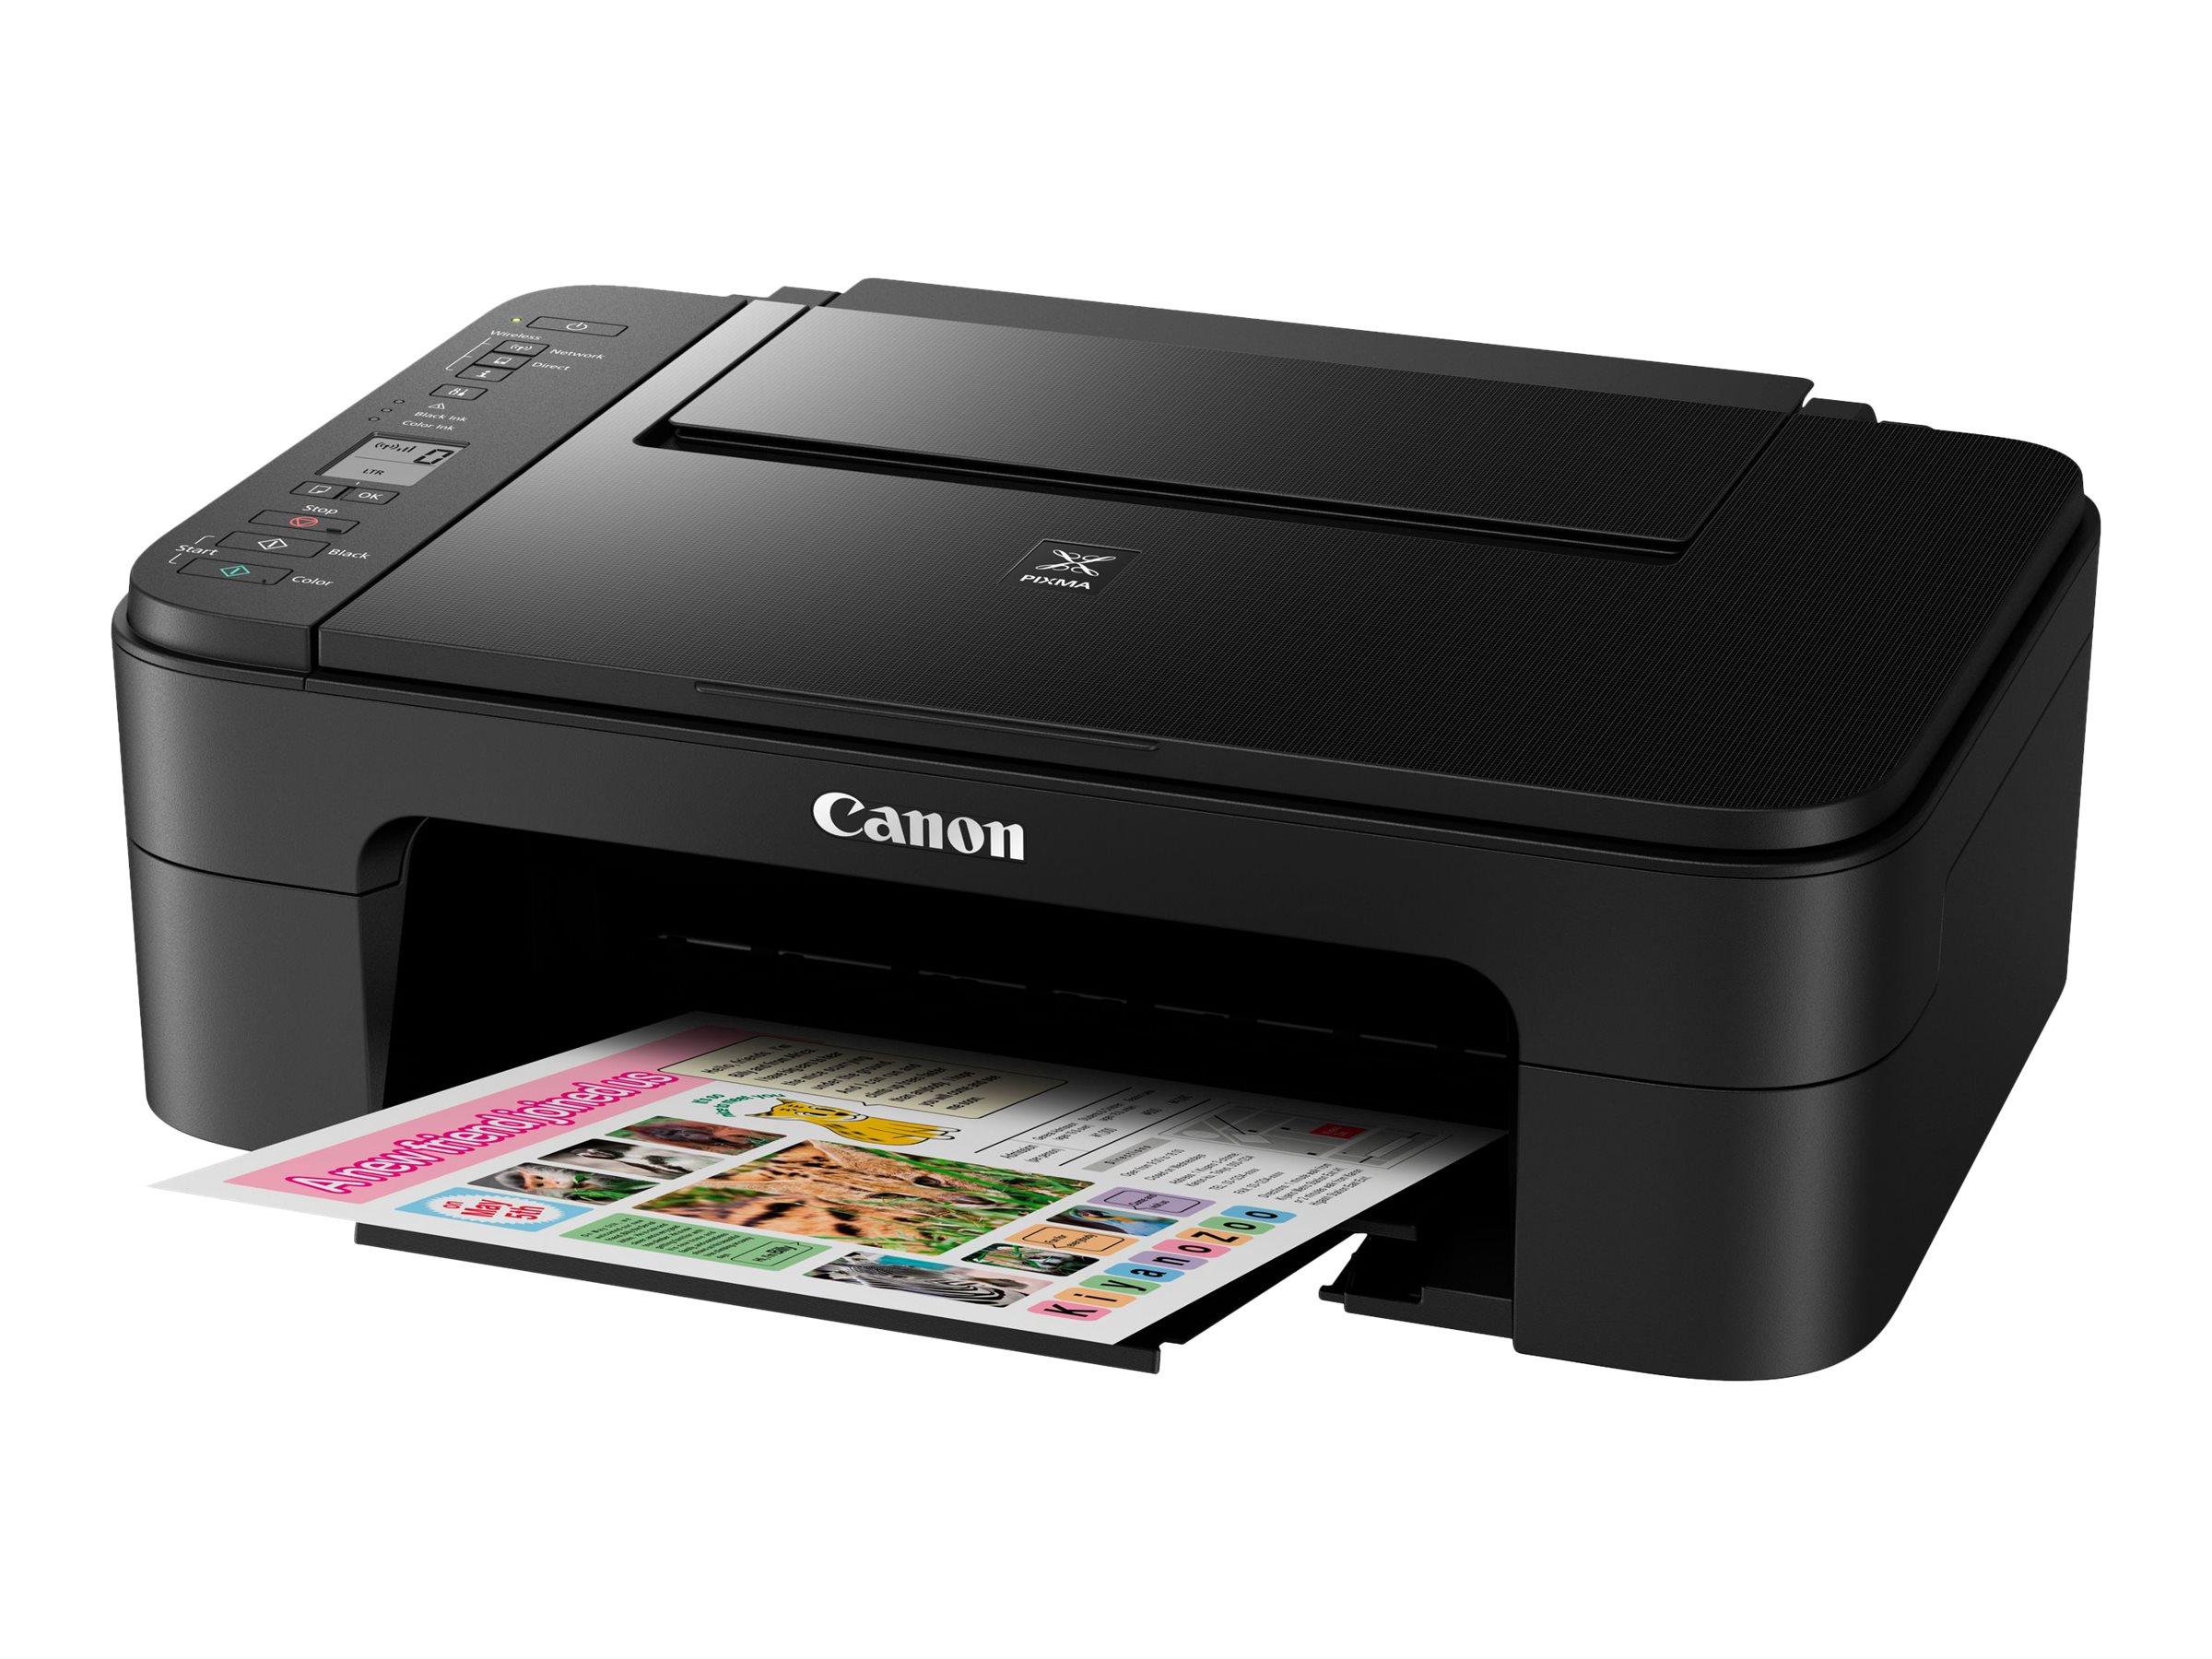 Canon PIXMA TS3150 - Multifunktionsdrucker - Farbe - Tintenstrahl - 216 x 297 mm (Original) - A4/Legal (Medien)